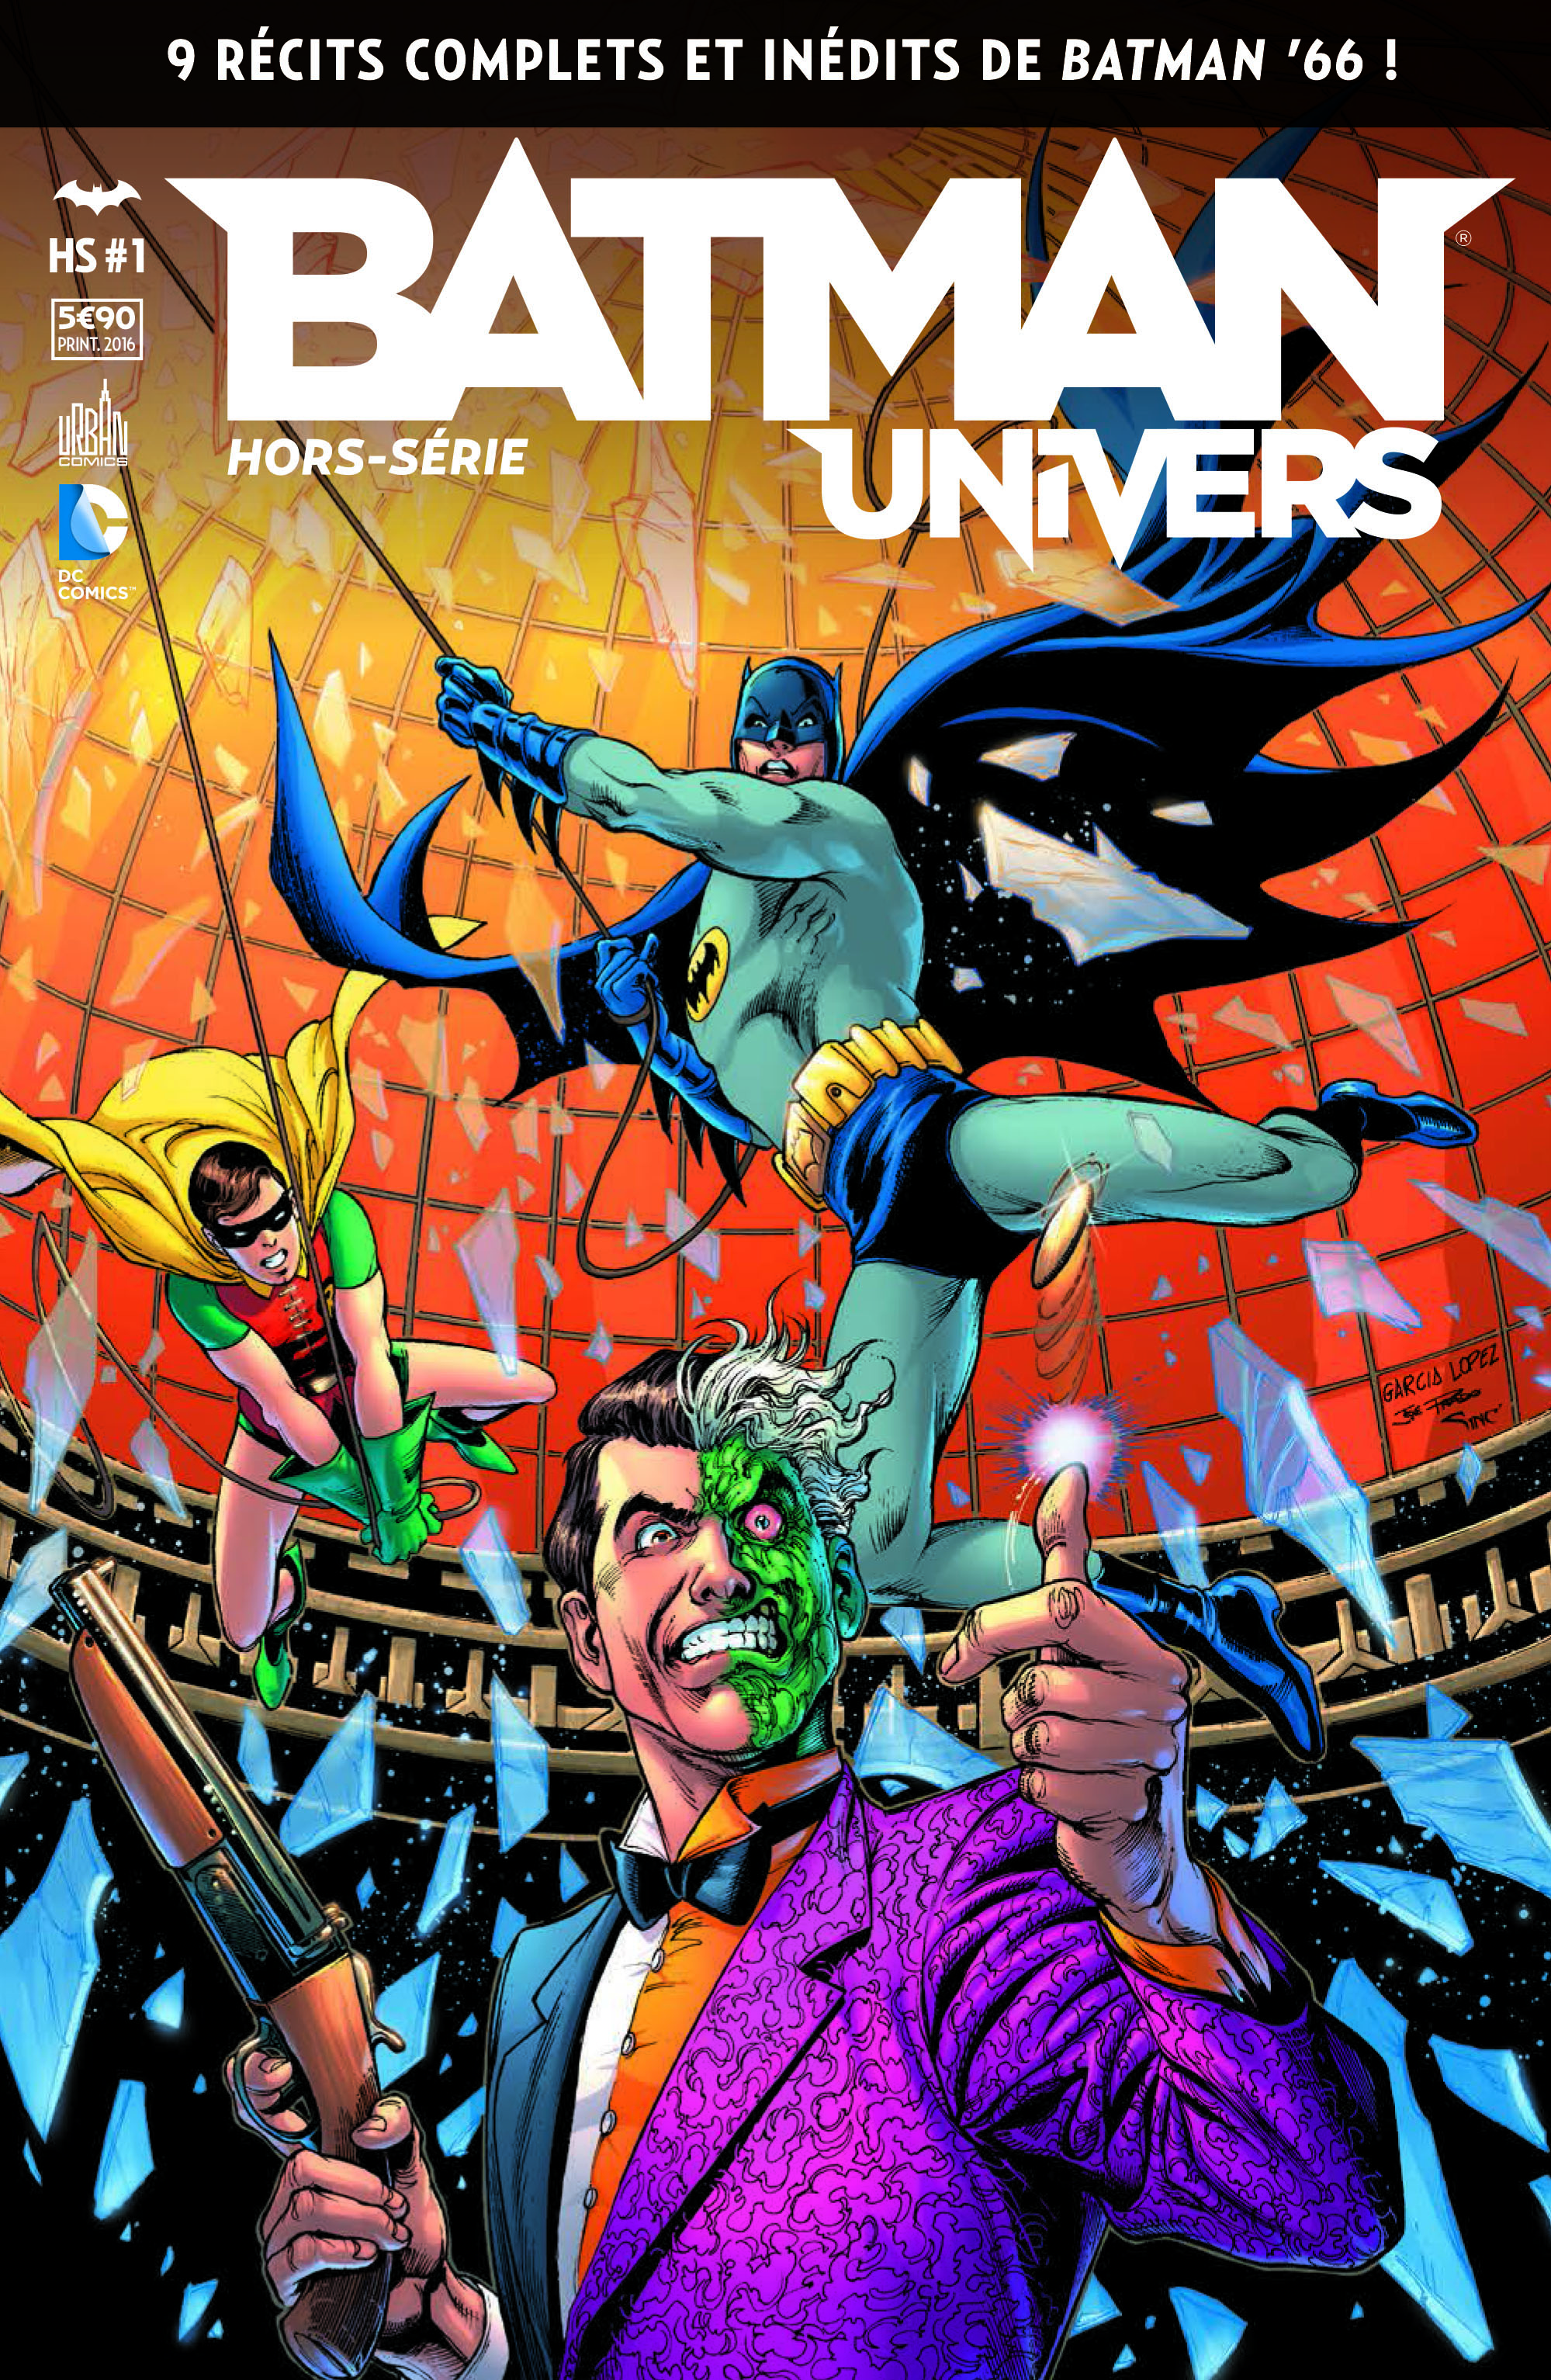 Batman Univers Hors-Série 1 - BATMAN '66